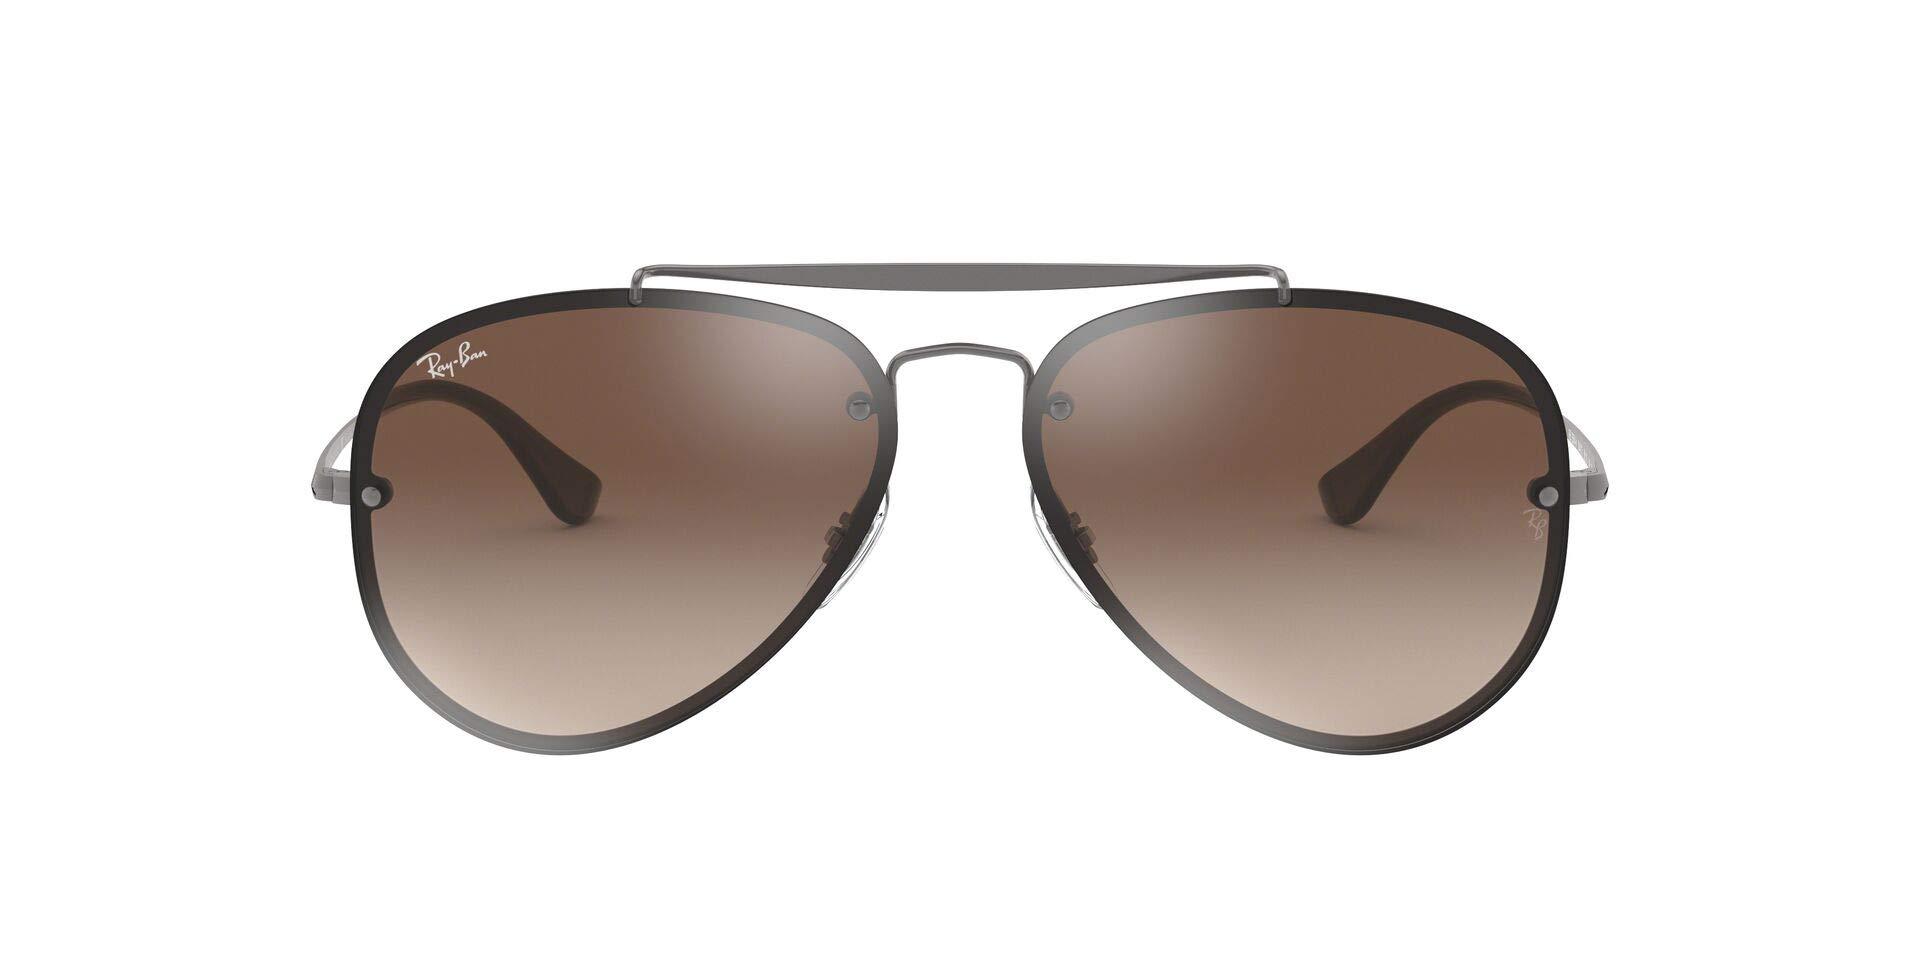 Ray-Ban Women's Blaze Flat Lens Pilot Aviator Sunglasses